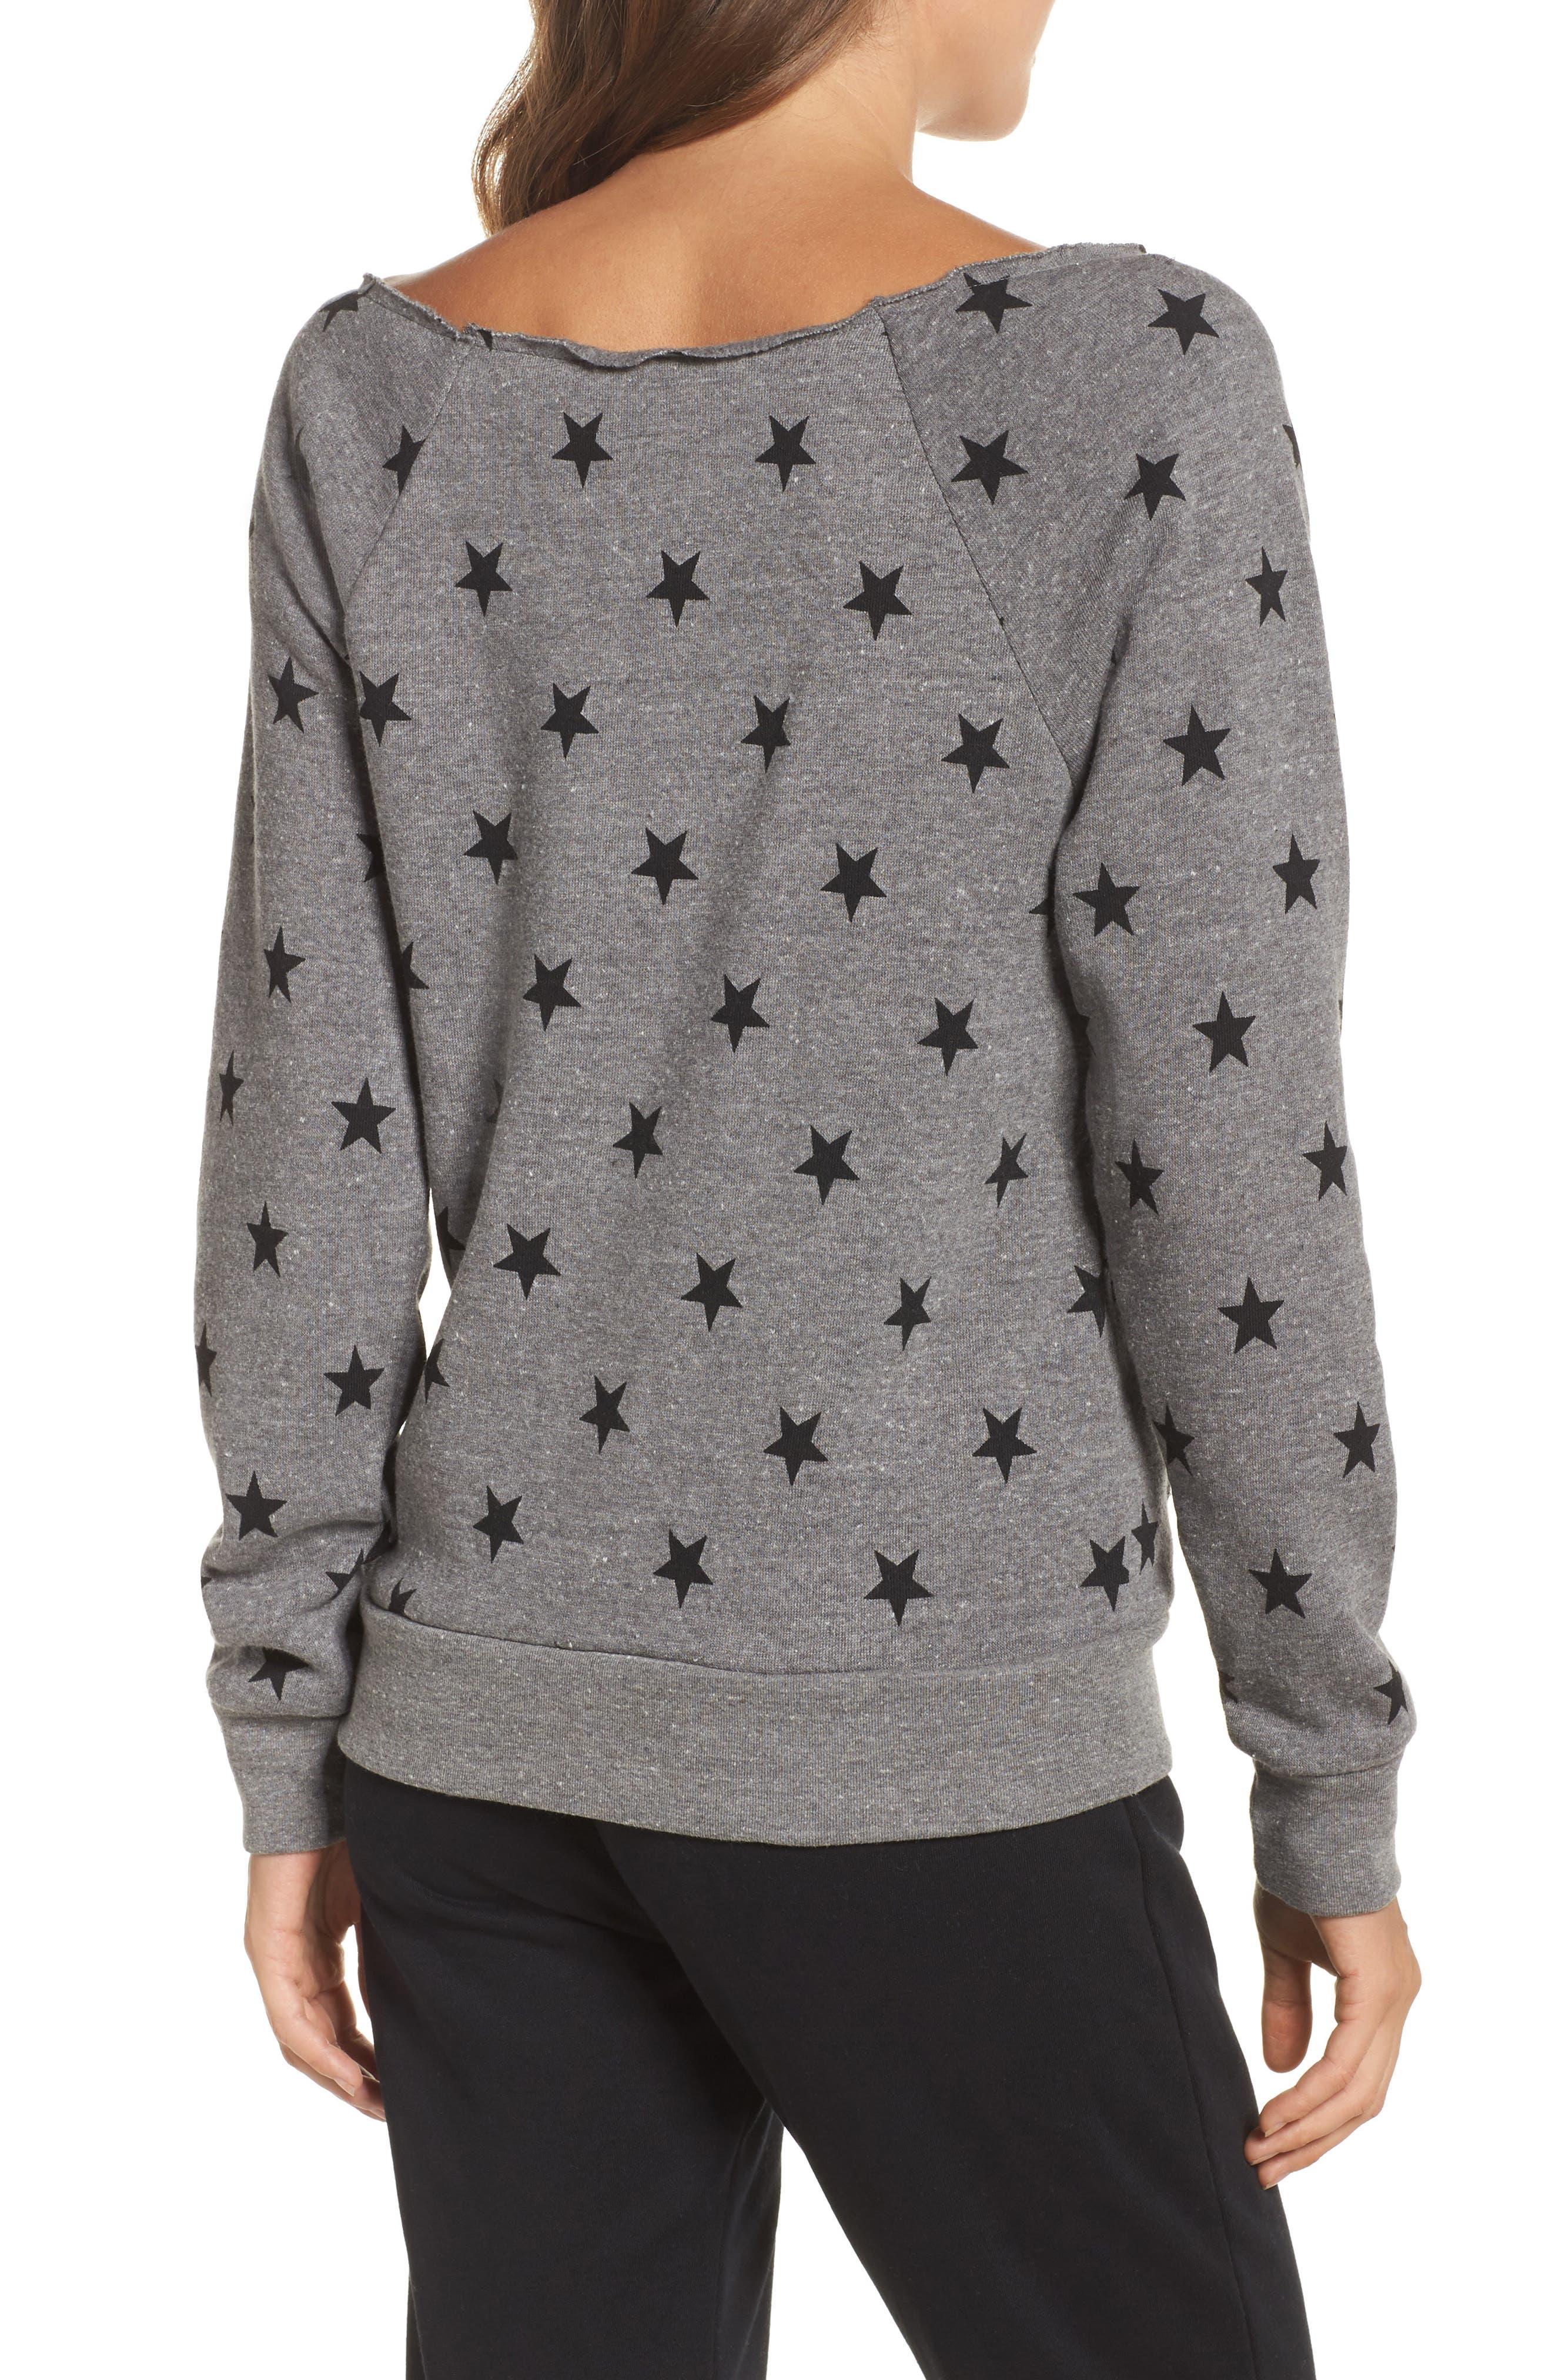 Maniac Camo Fleece Sweatshirt,                             Alternate thumbnail 2, color,                             Eco Grey Stars